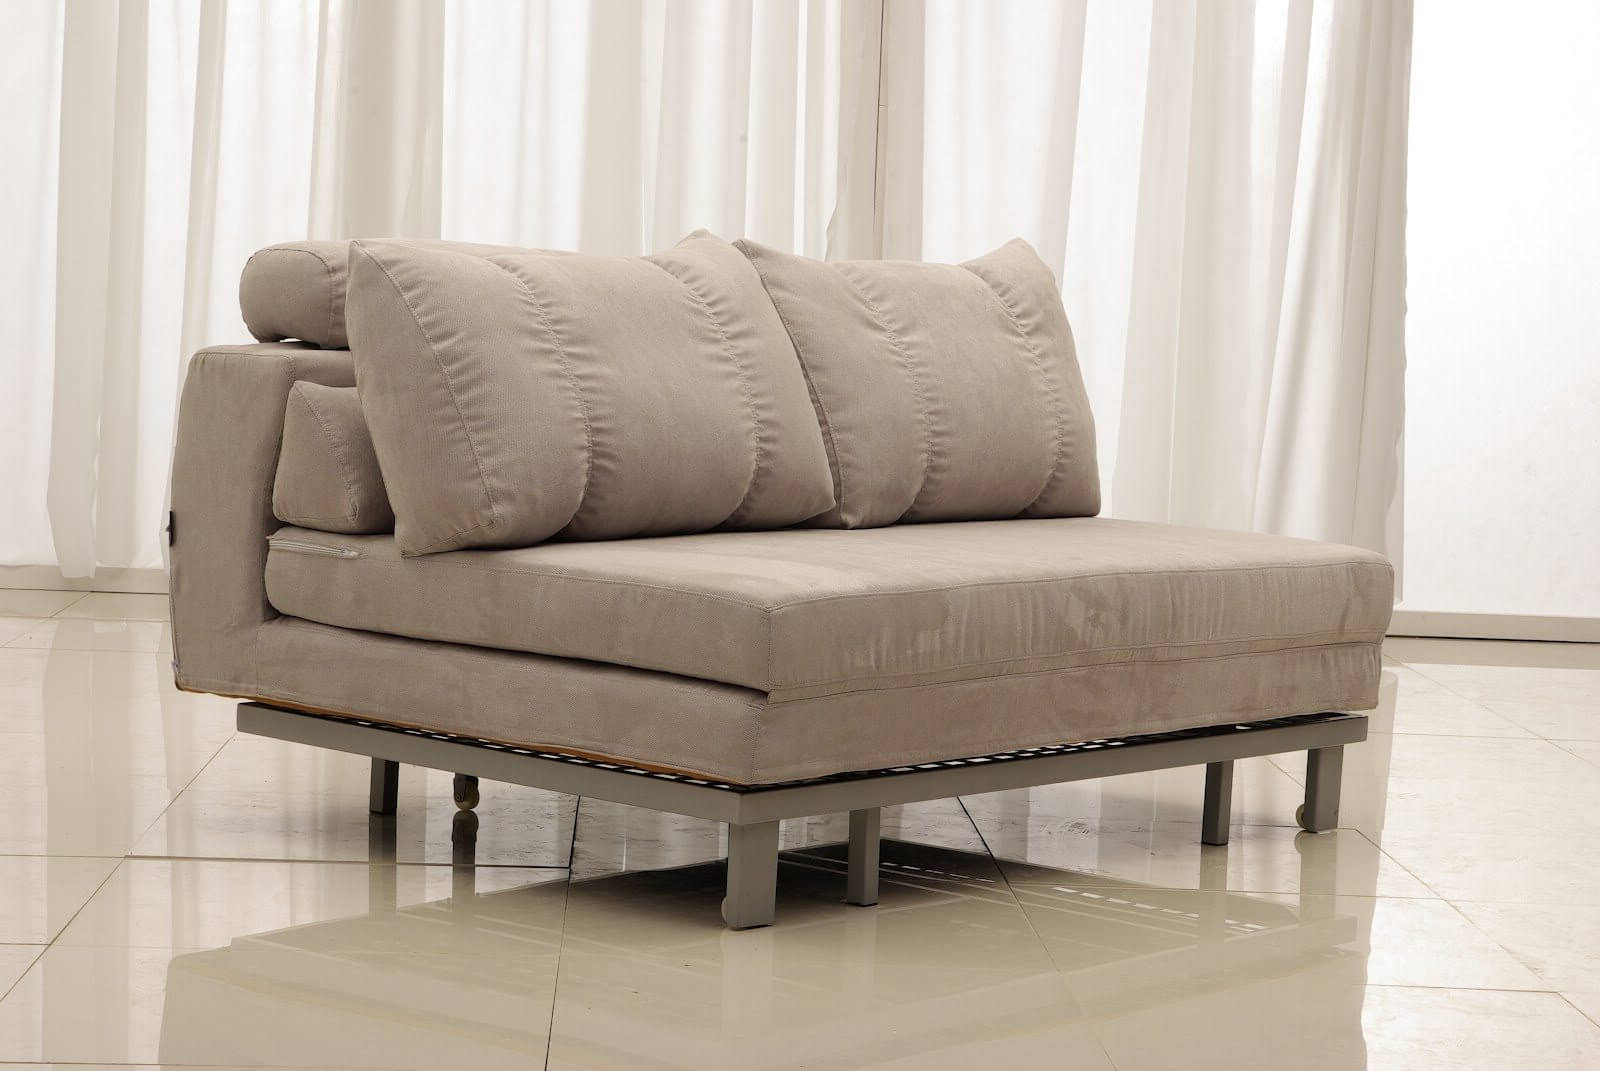 Current Felton Modern Style Pullout Sleeper Sofas Black With Regard To Wonderful Sleeper Sofas Ideas Hiding Cozy Furniture To (View 13 of 25)